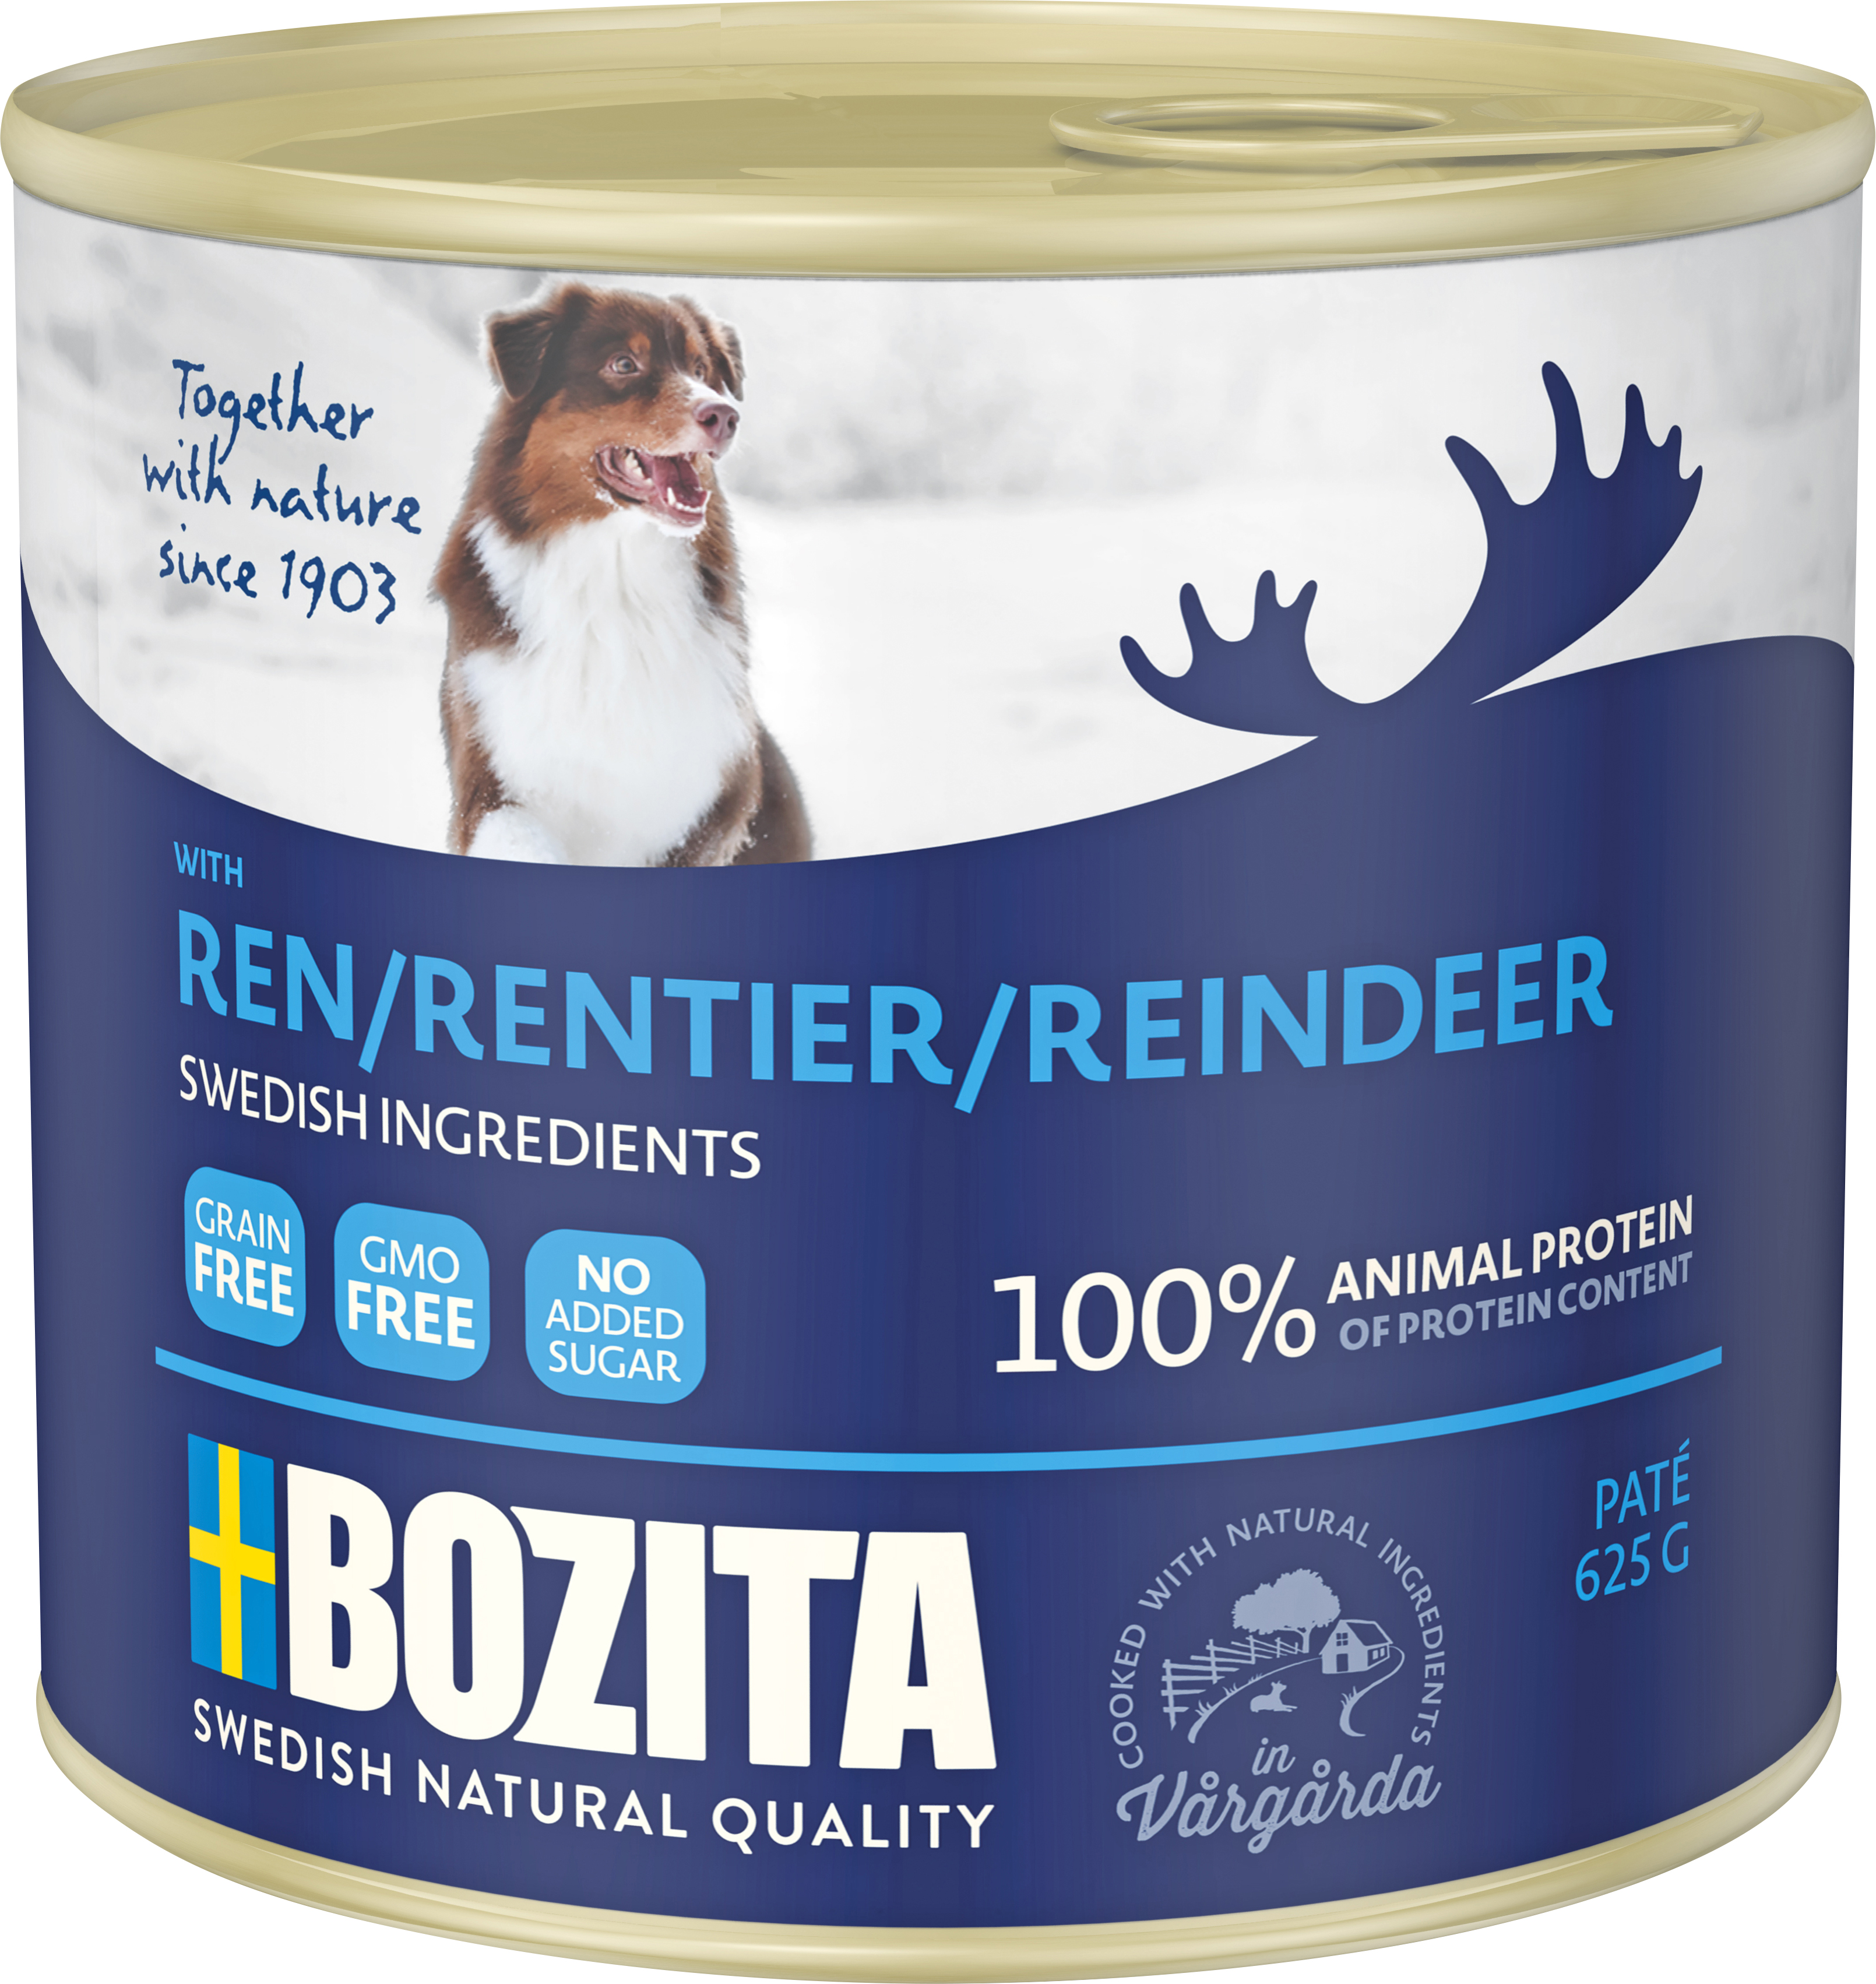 Hundfoder Bozita Ren Konserv 625 gram